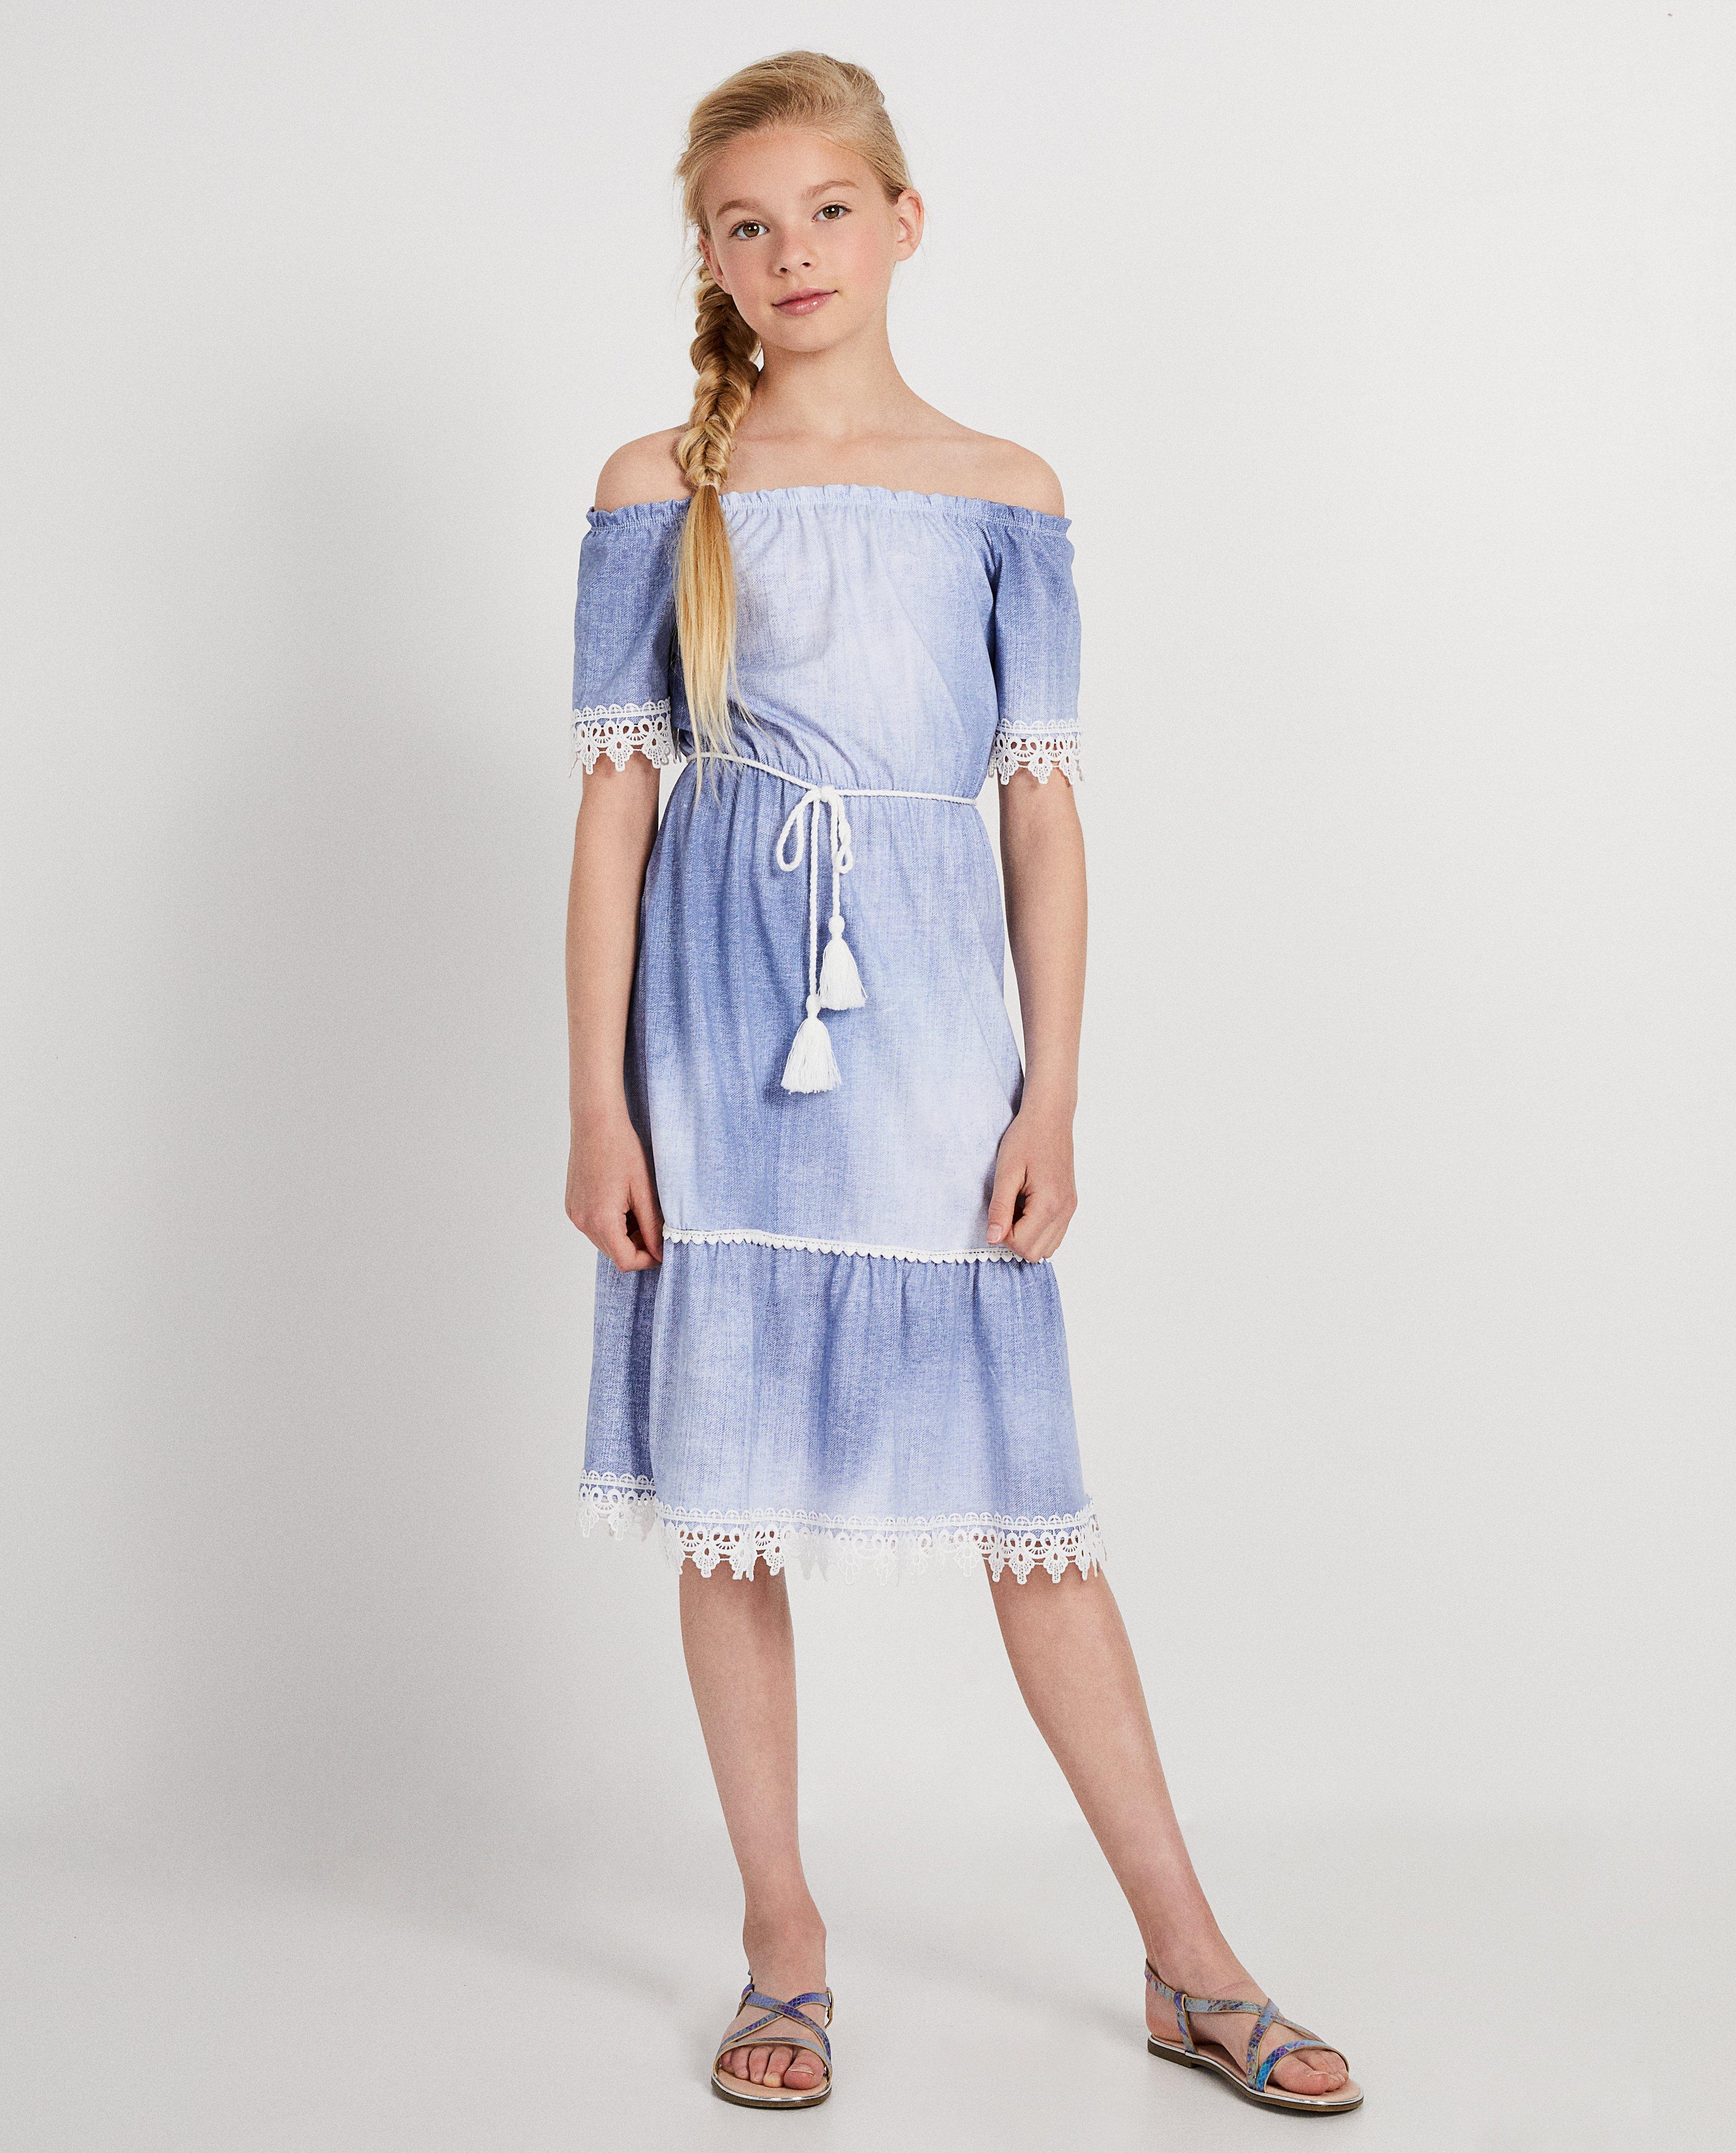 4e68754505e4a2 Blauwe jurk met kant Elle Italia met denimlook